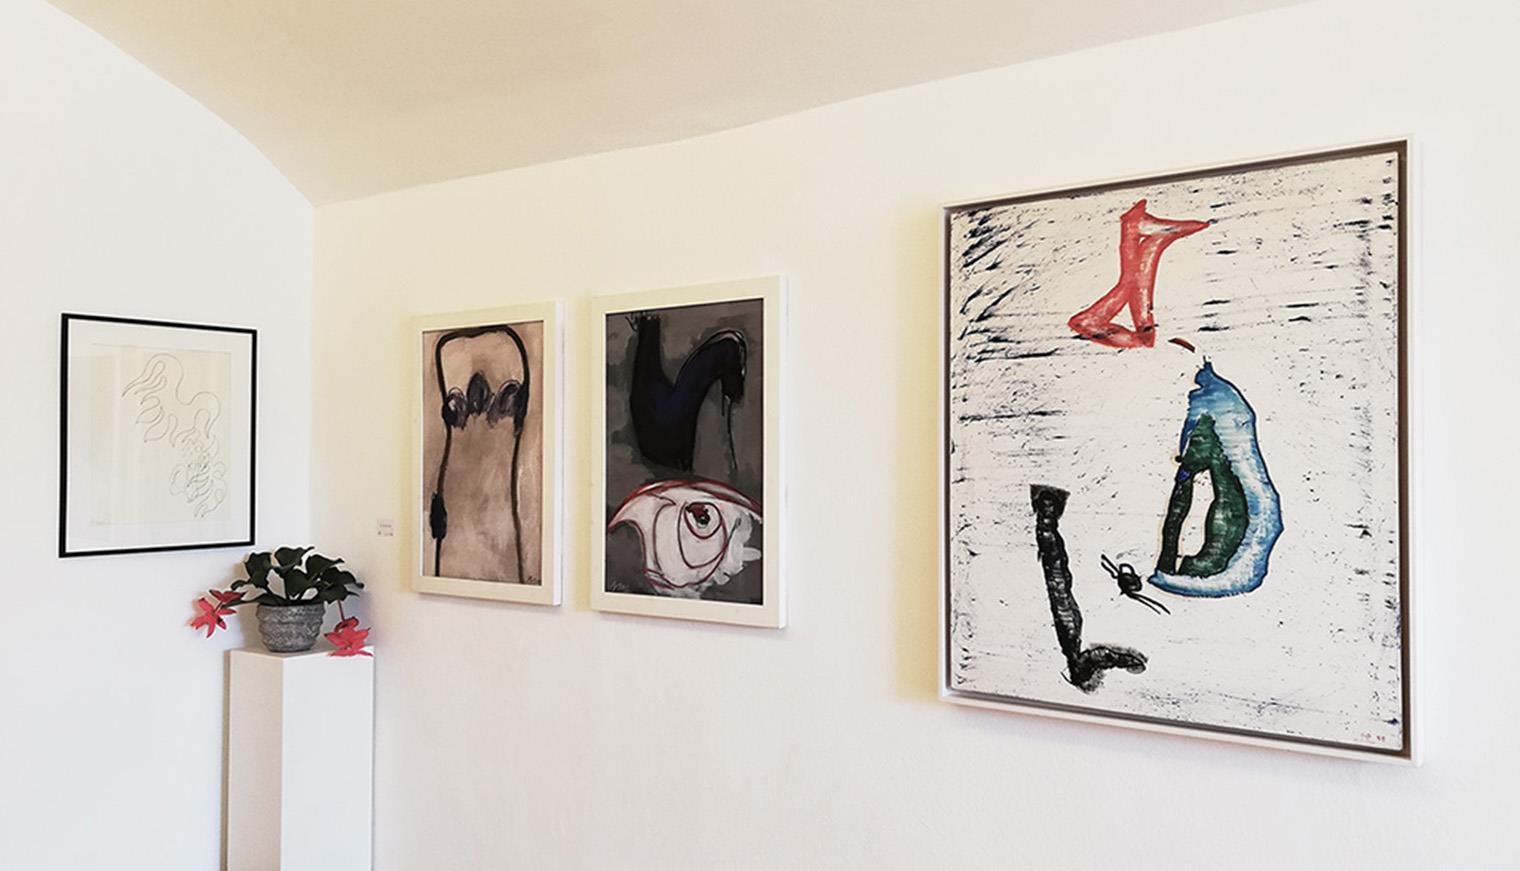 Galerie Mathias Mayr